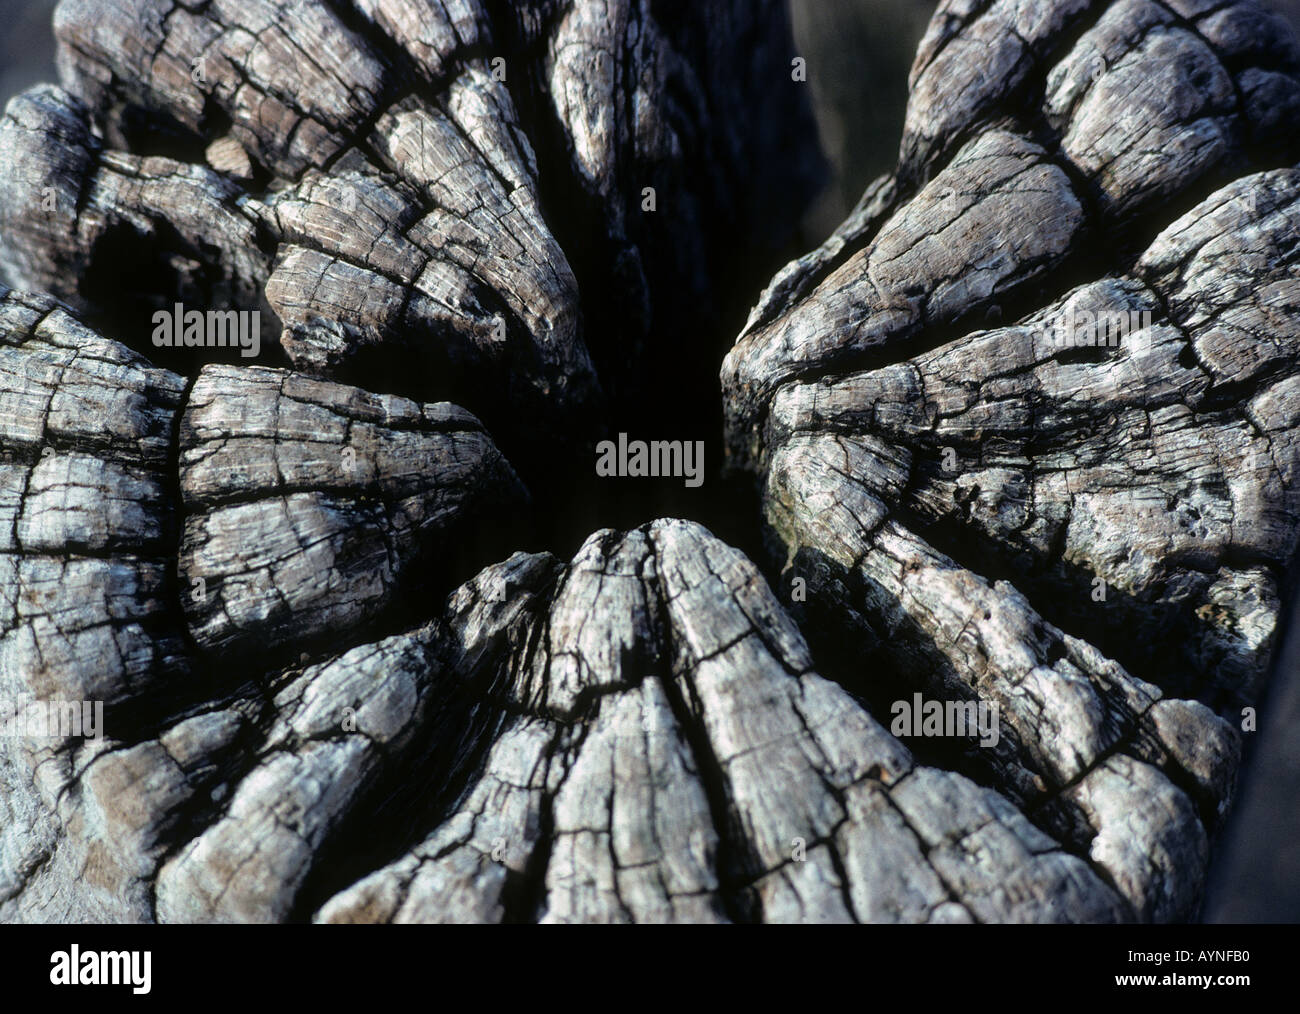 Cerca de capeado tocón de madera blanqueada apoyando un muelle abandonado Imagen De Stock